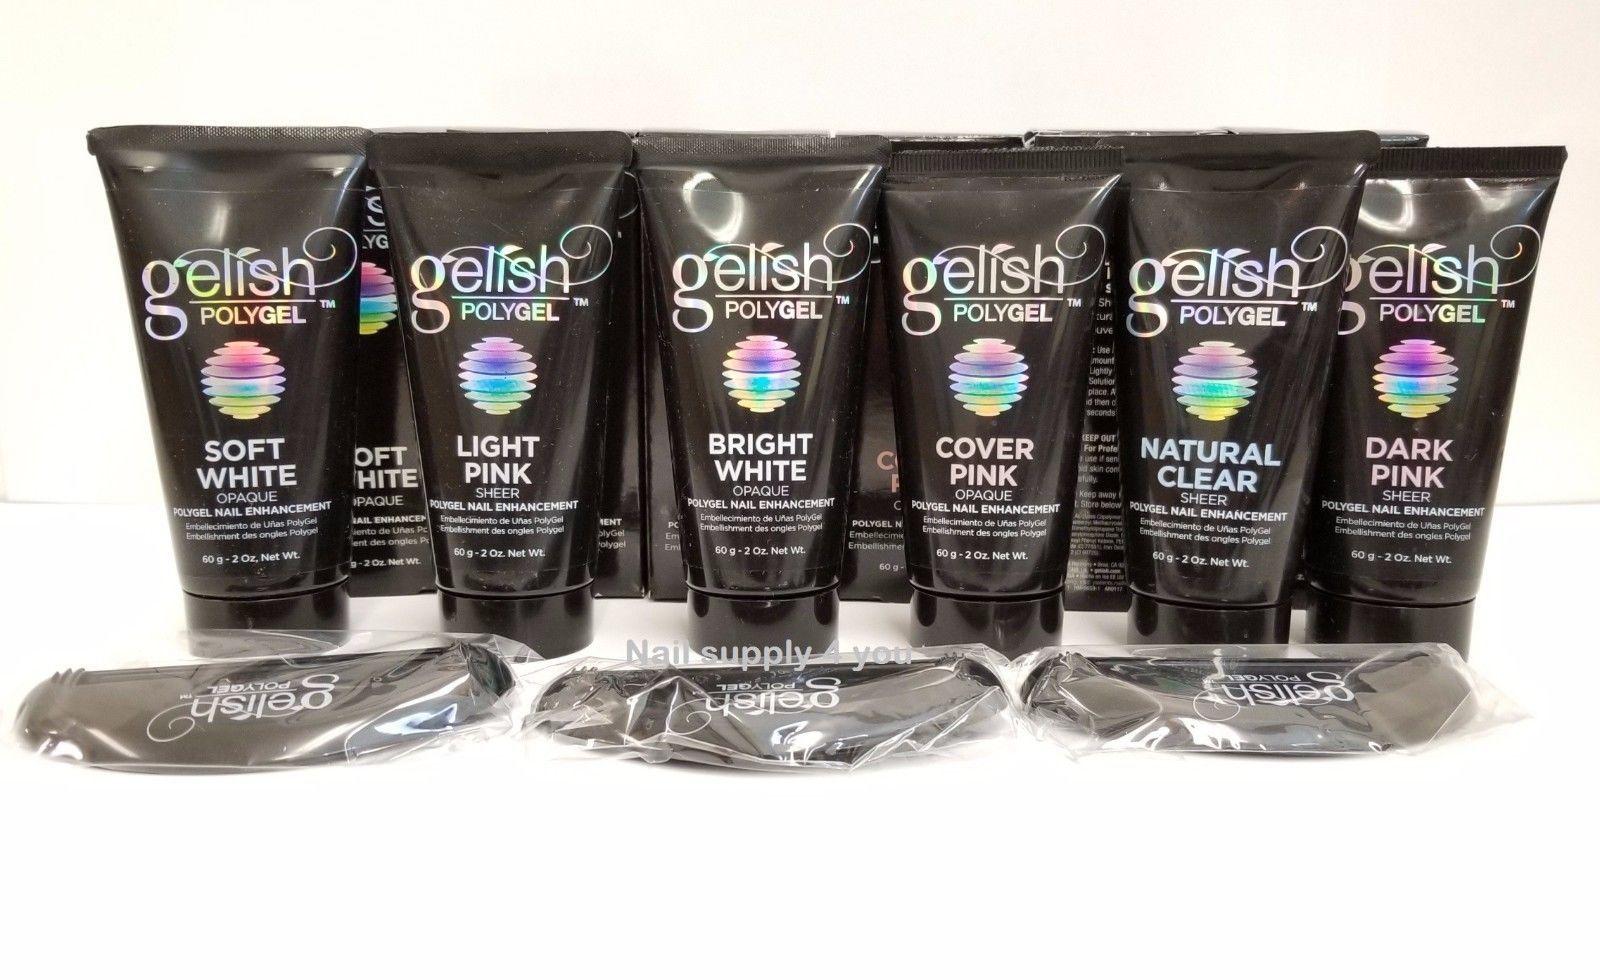 Harmony Gelish PolyGel - 2oz/60g Tube - Choose your colors